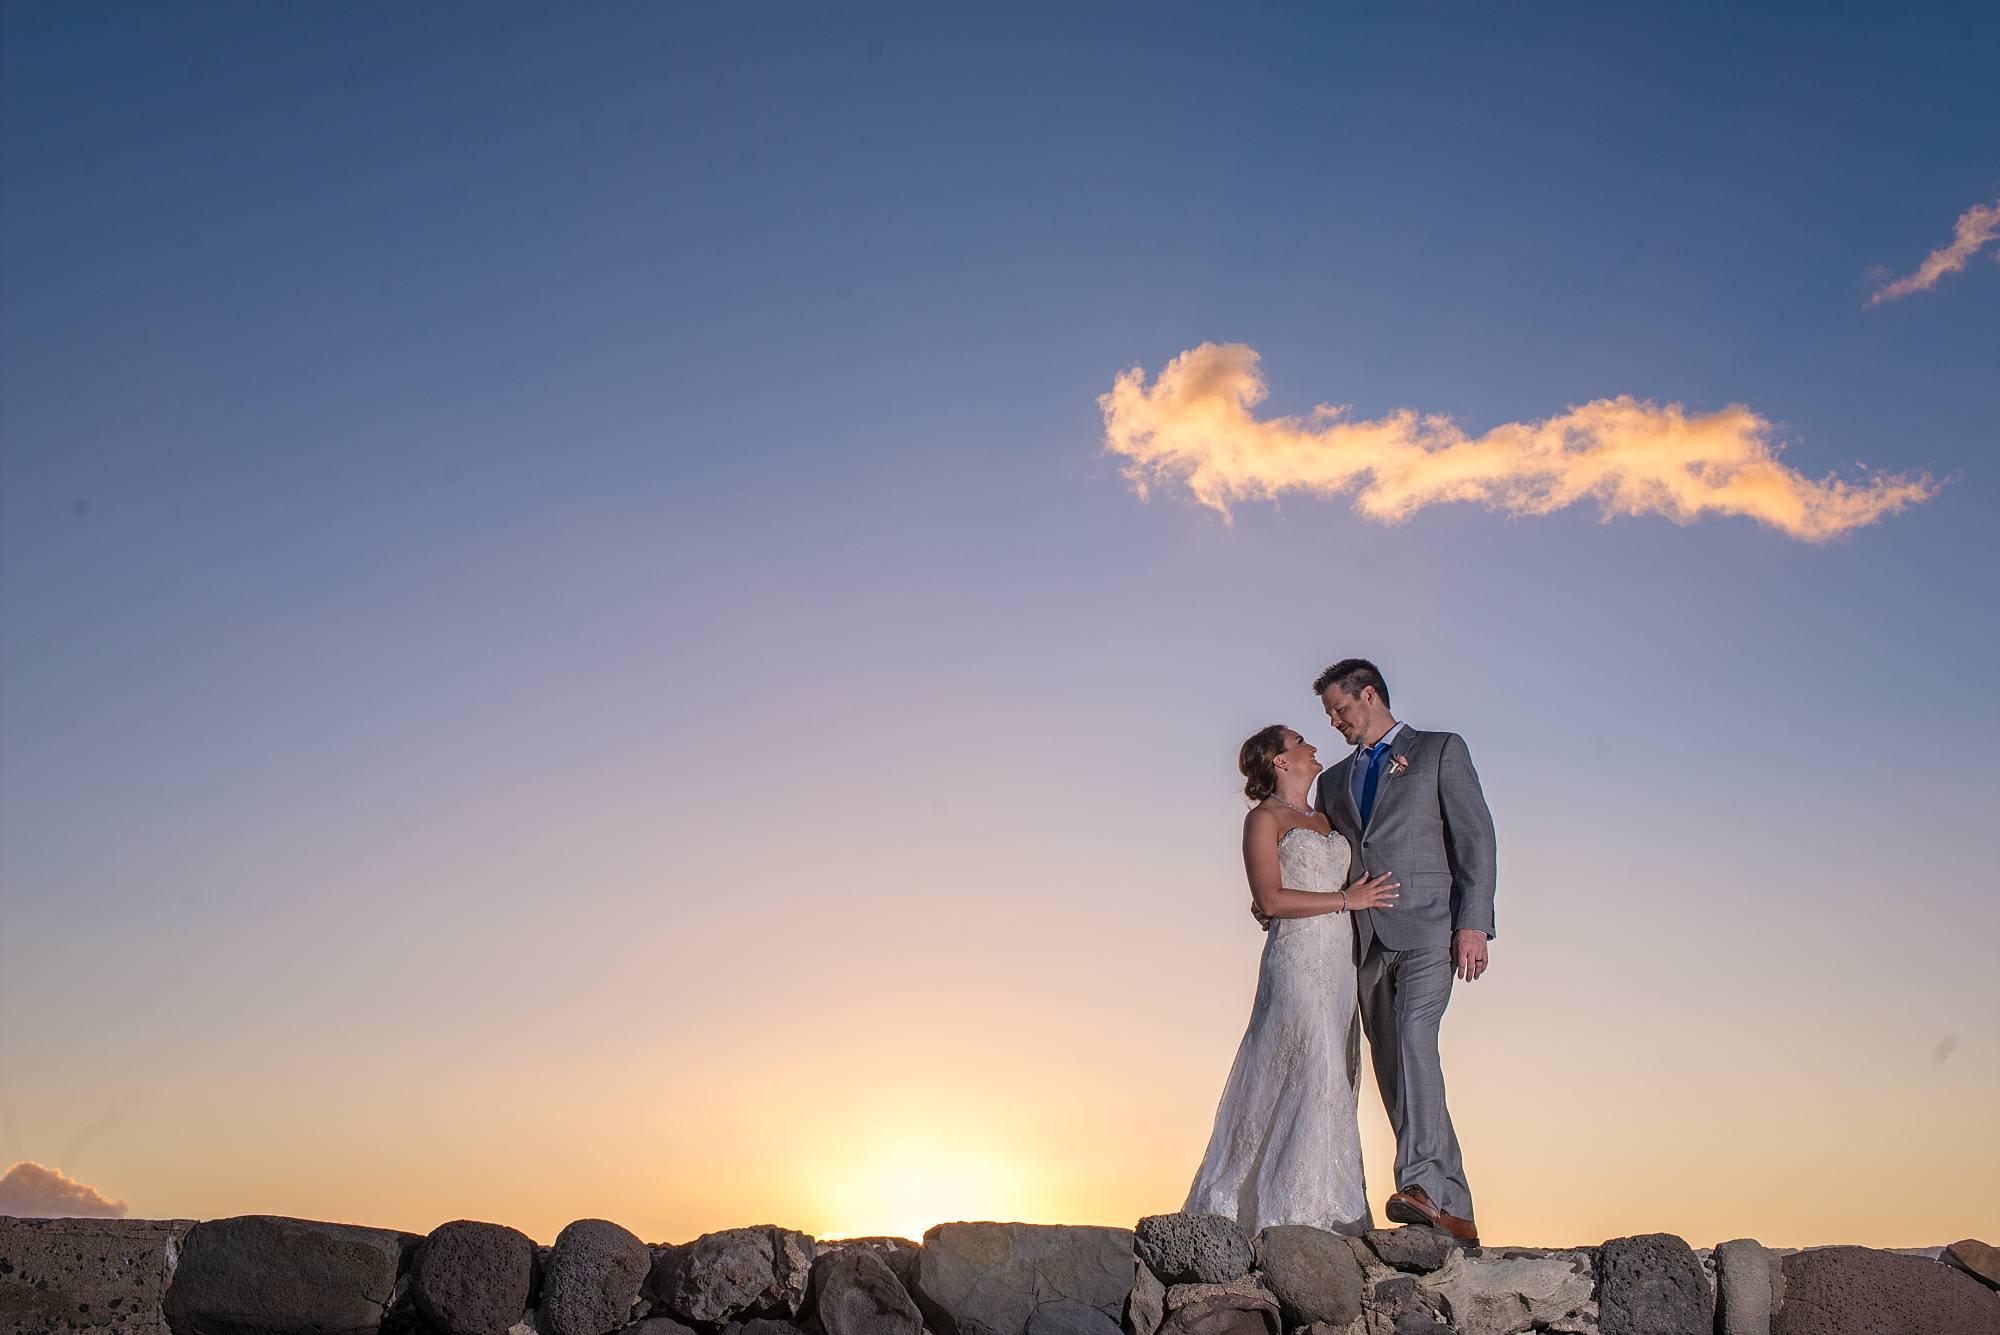 bride and groom on top of rocks